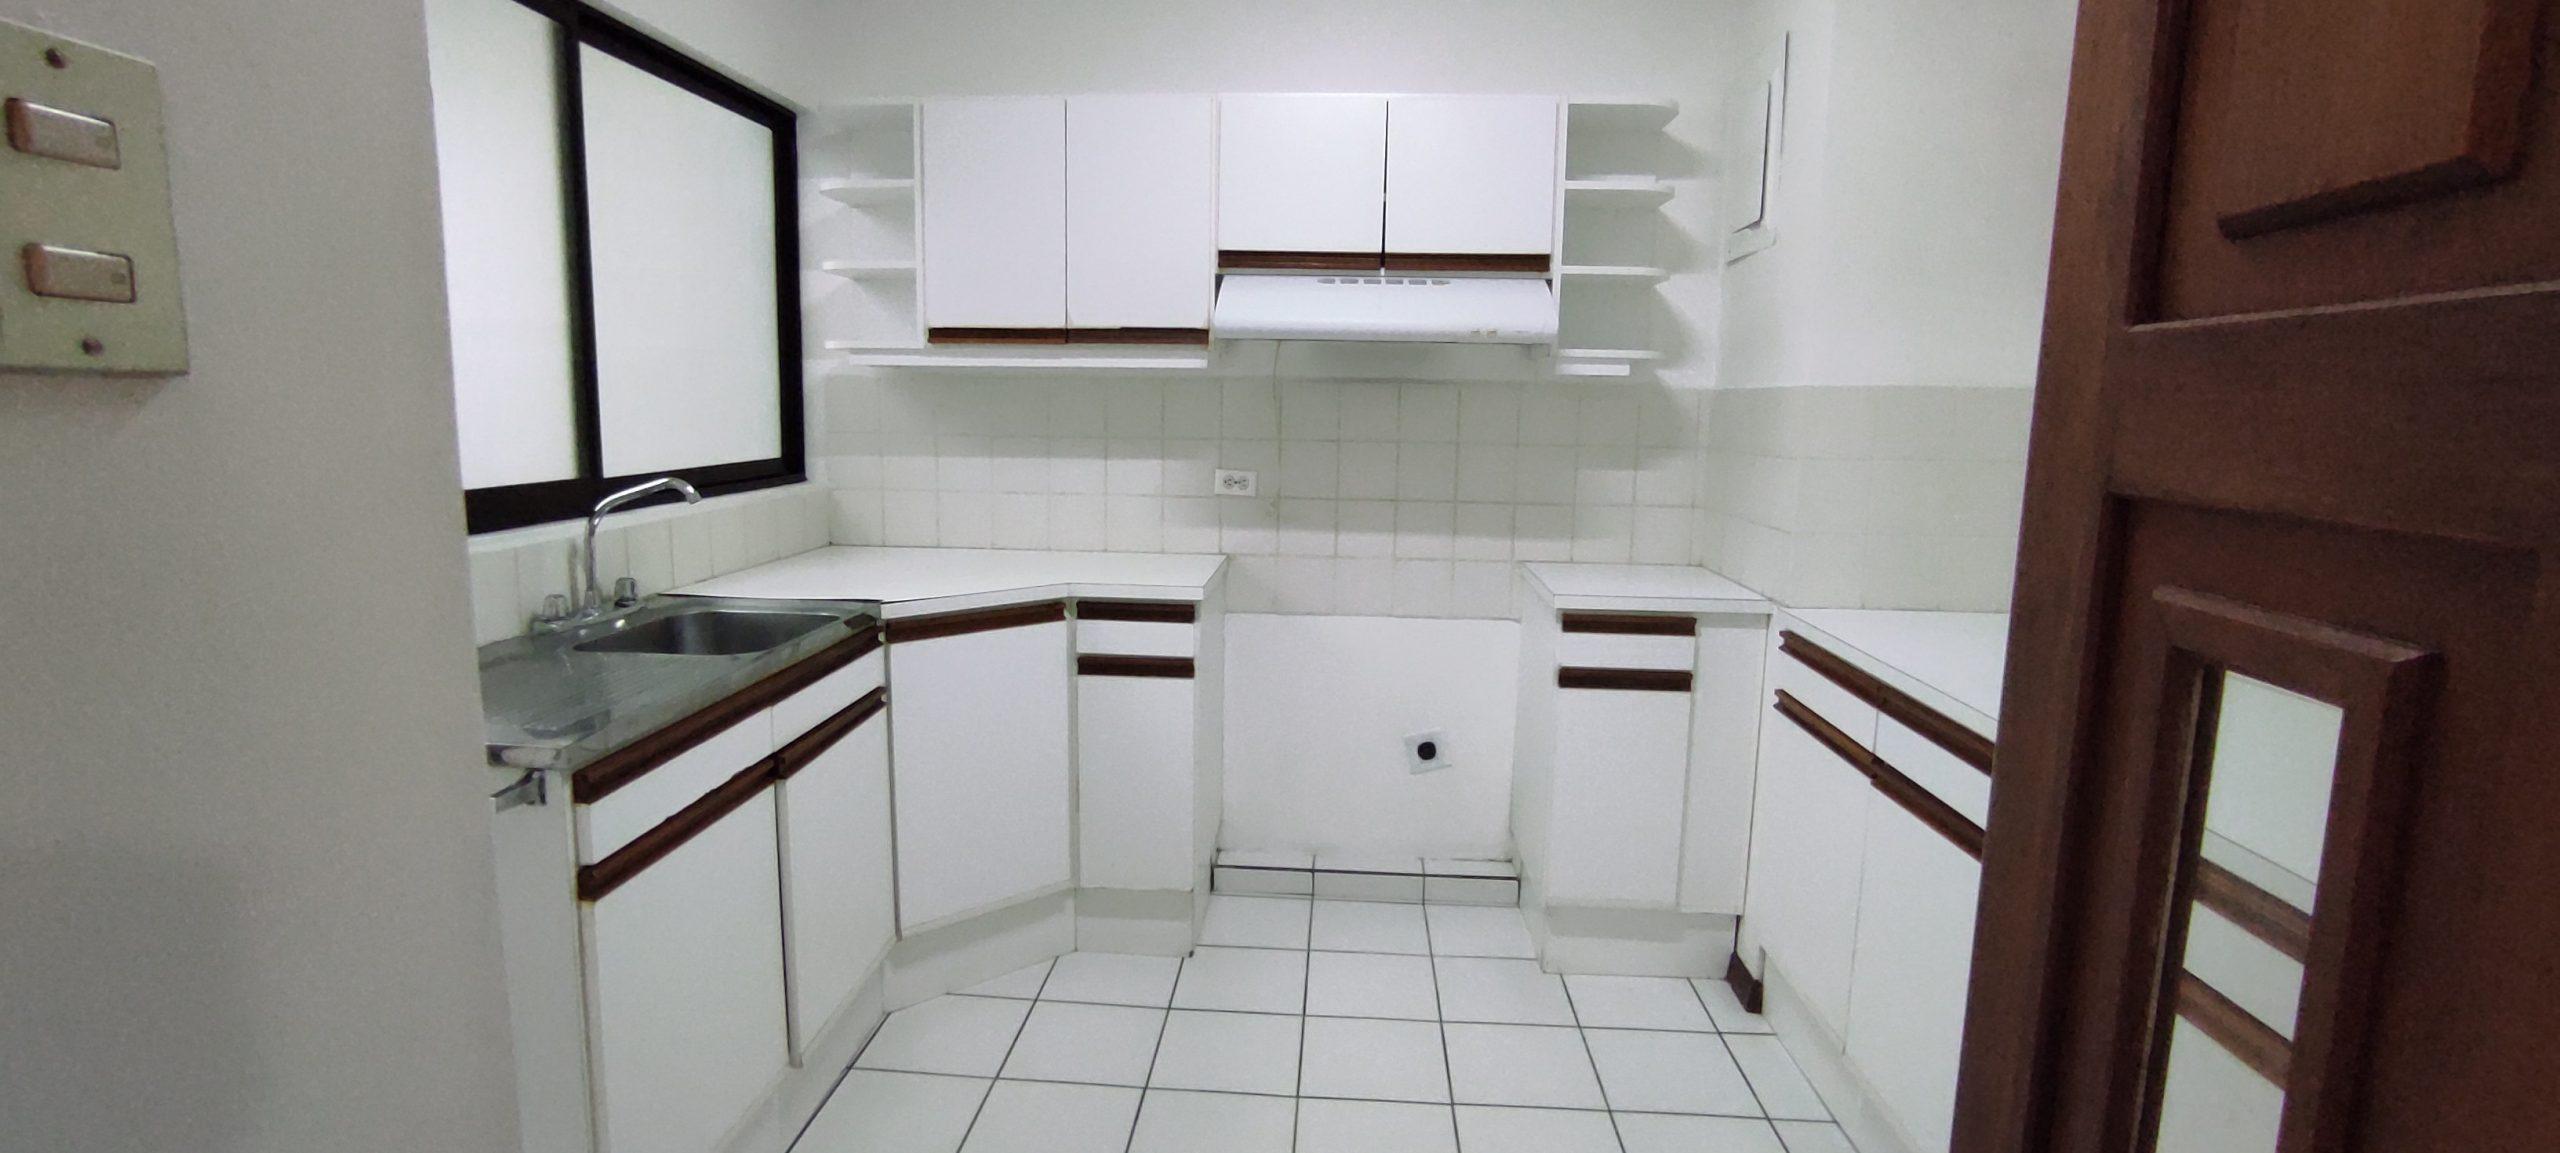 # 765 Se Alquila Apartamento en Curridabat